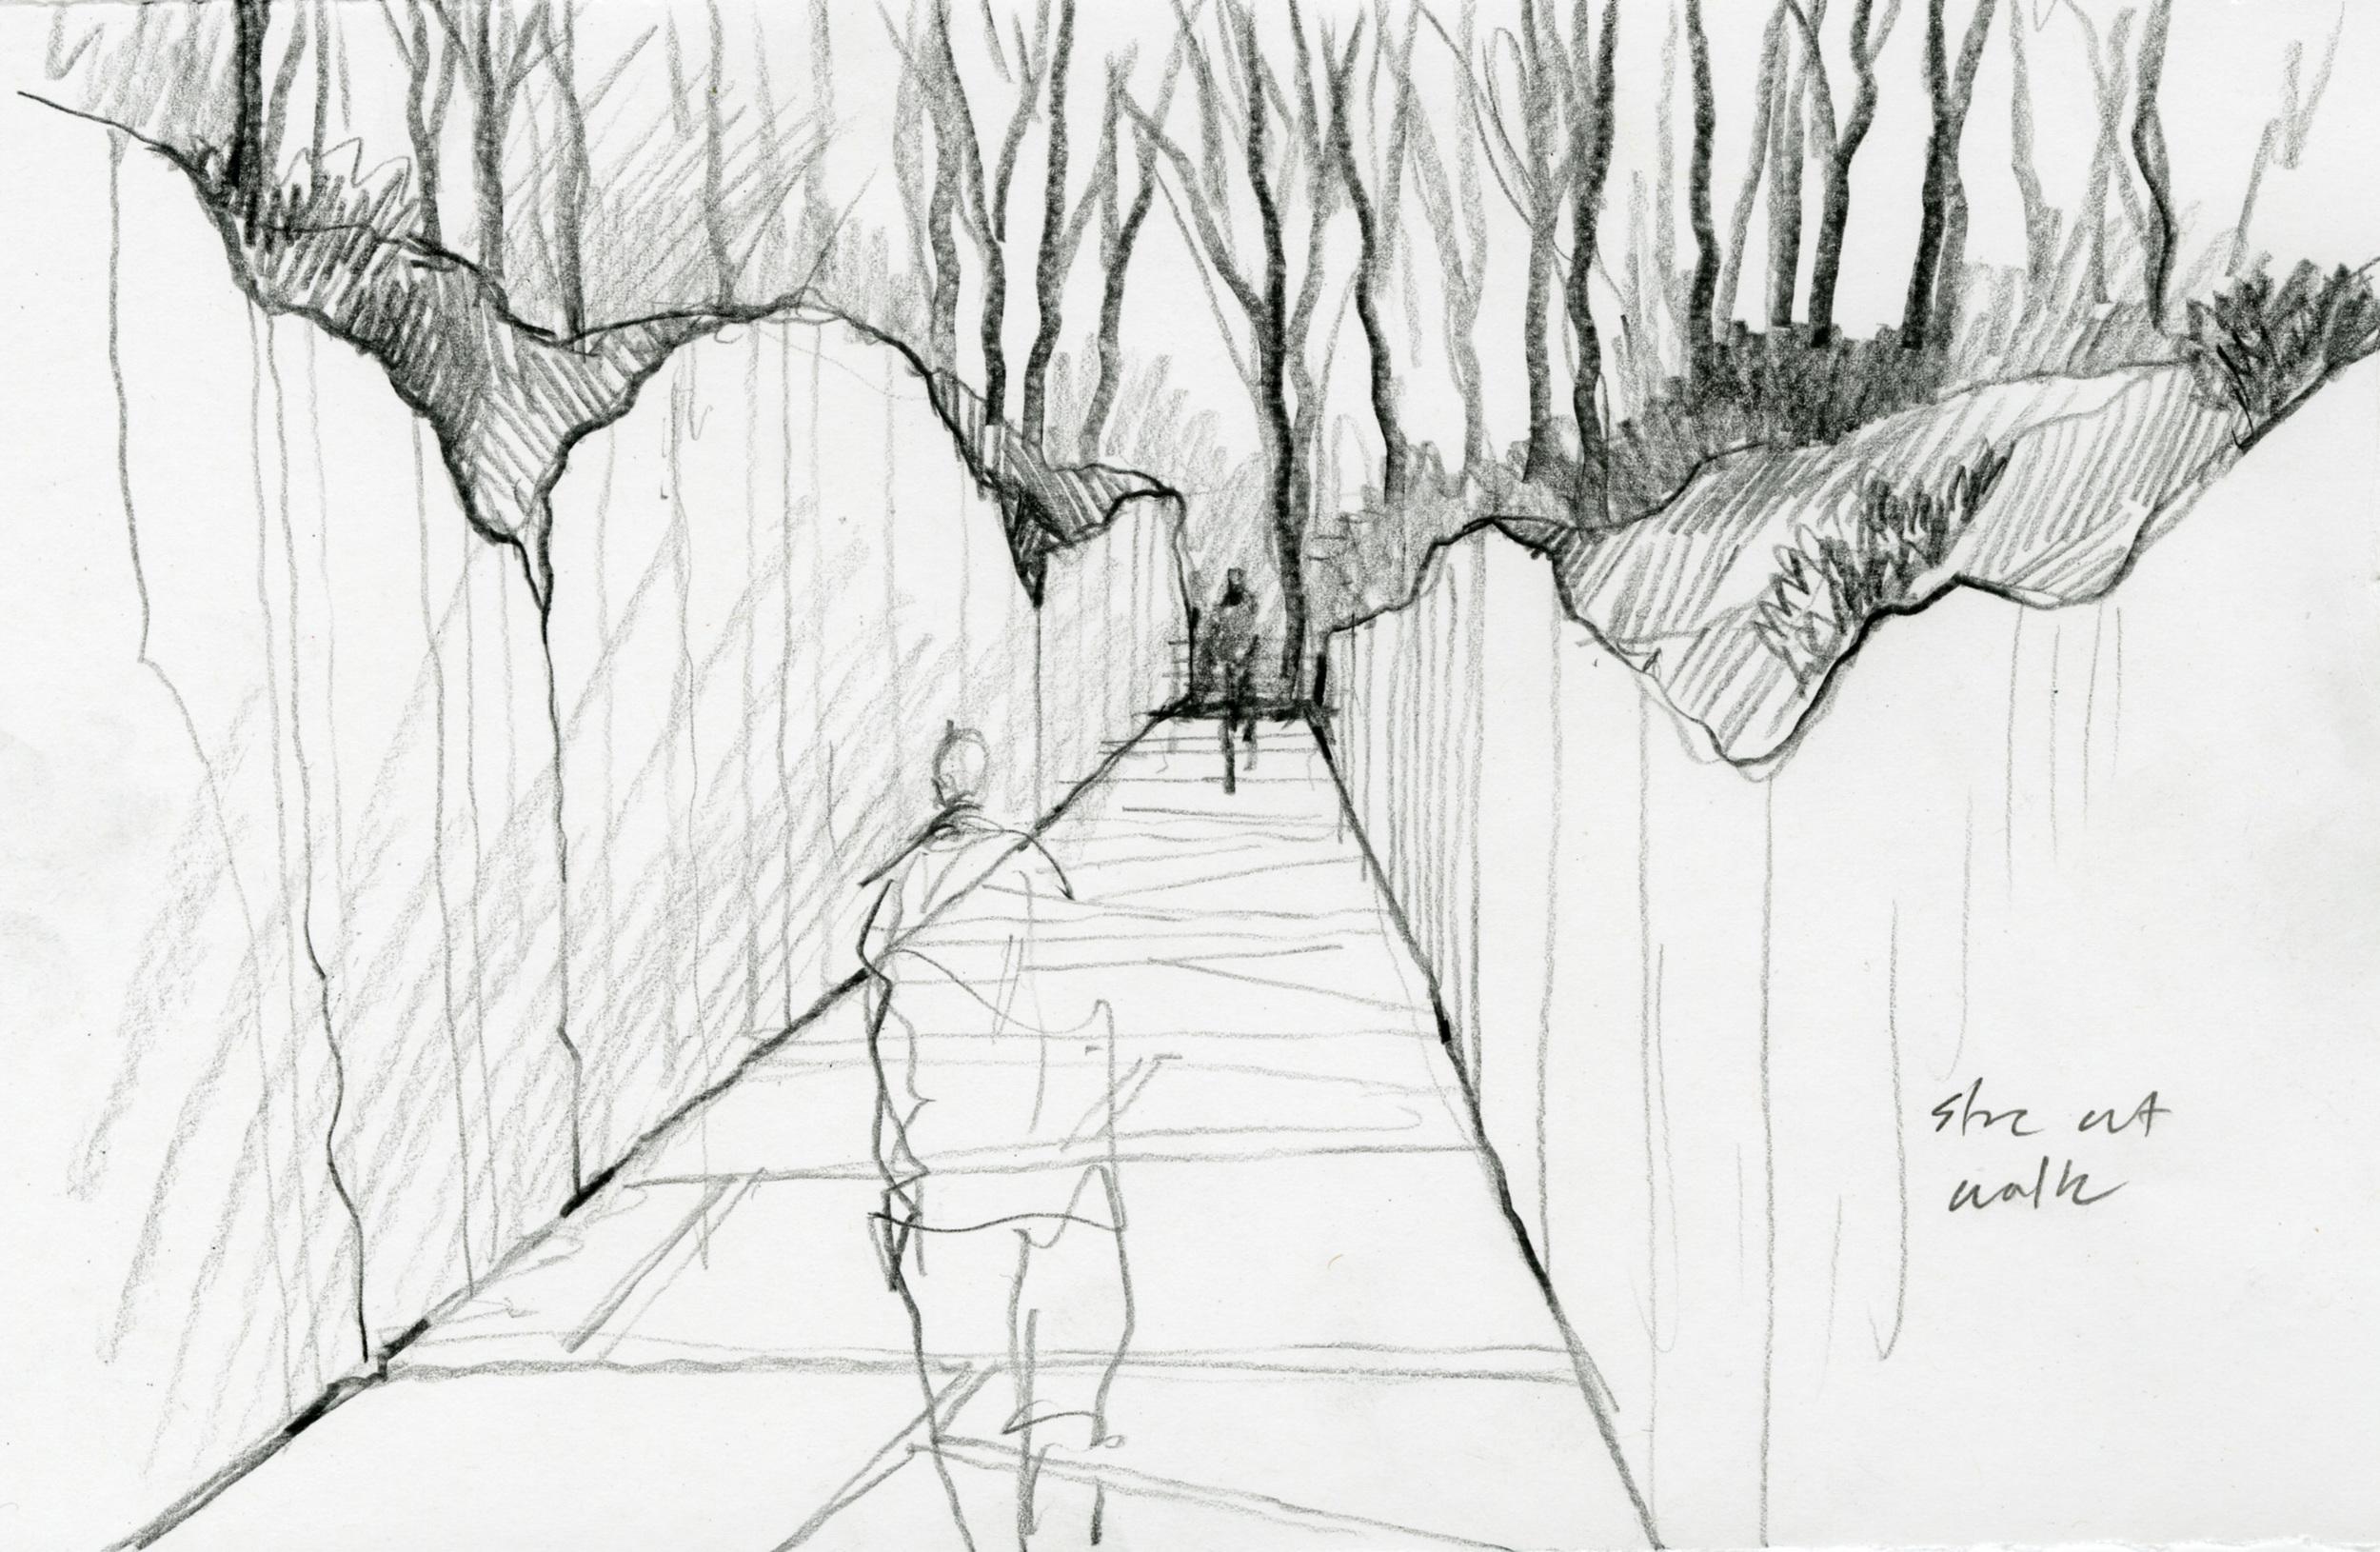 slice trail